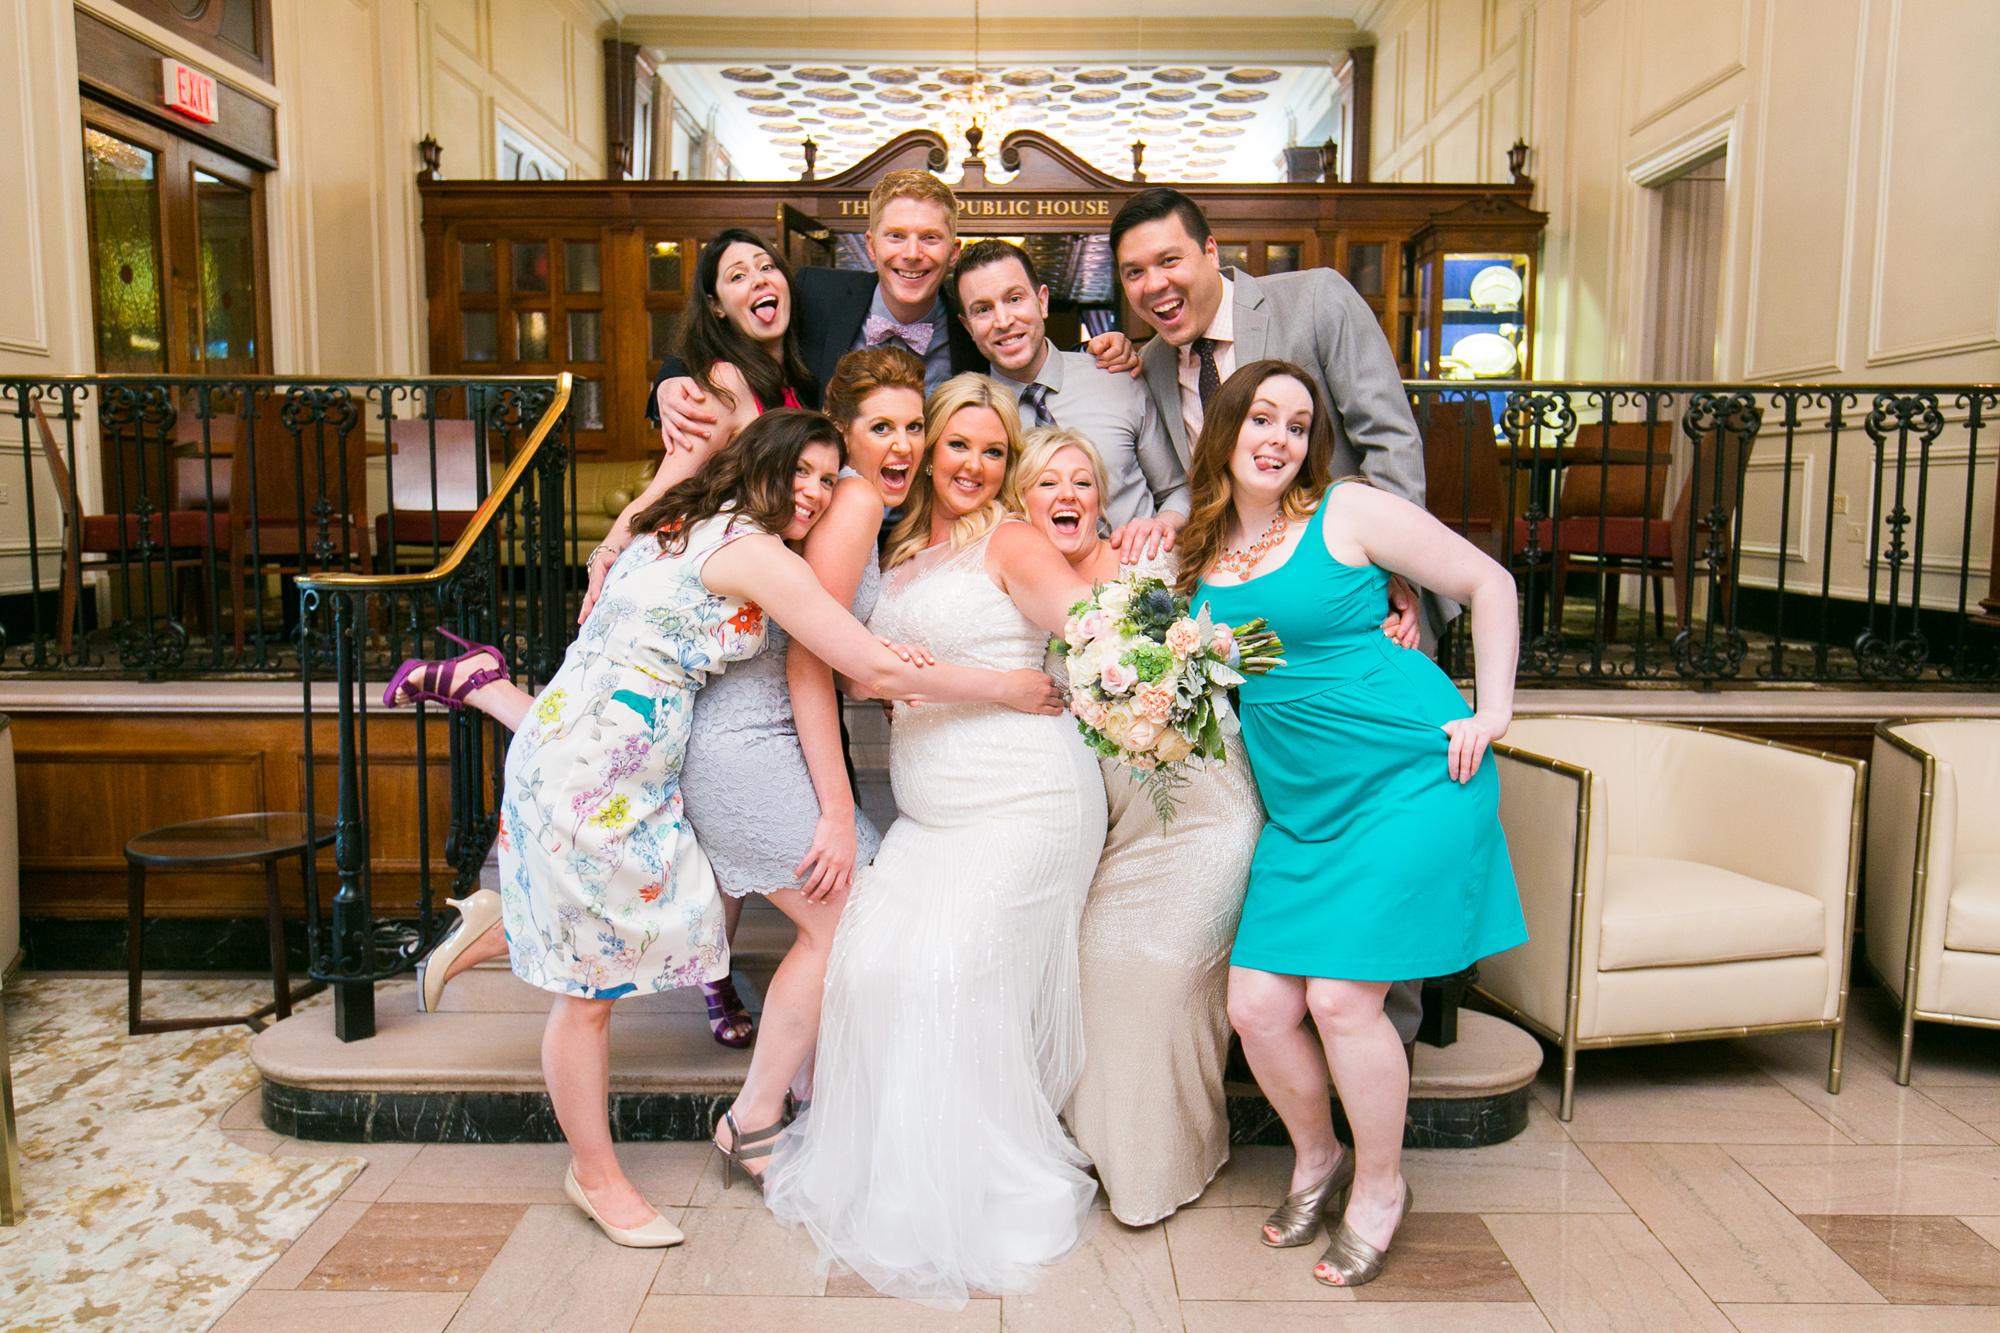 107-lord-nelson-wedding------.jpg